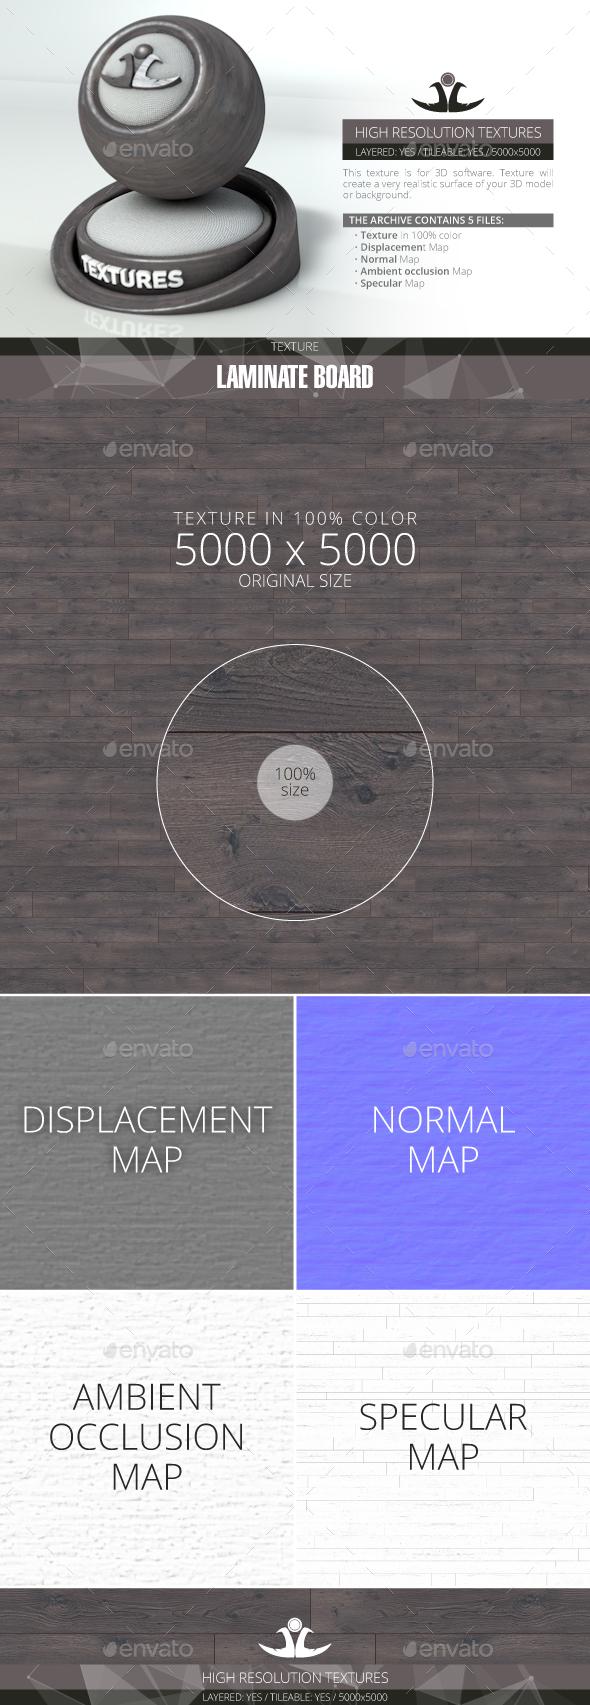 Laminate Board 52 - 3DOcean Item for Sale